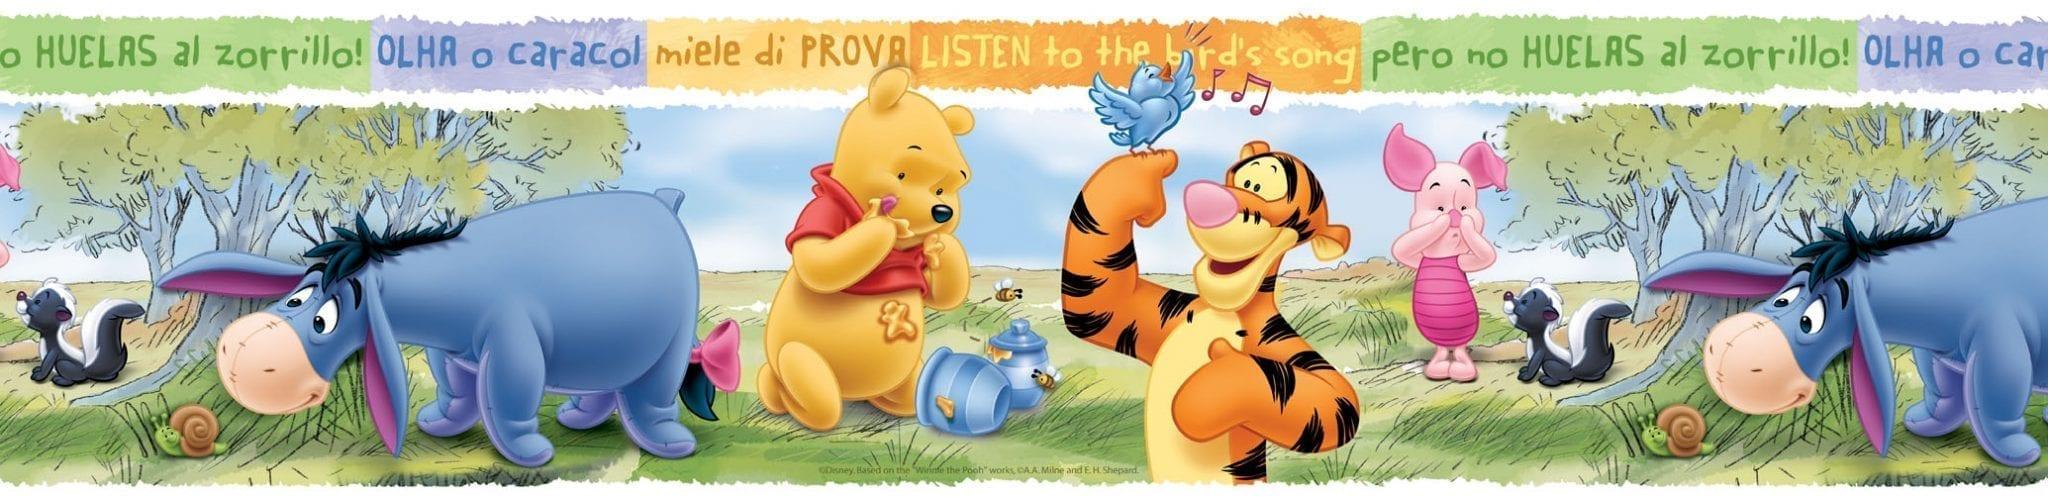 guarda de papel Winnie the pooh DISNEY 2566-1